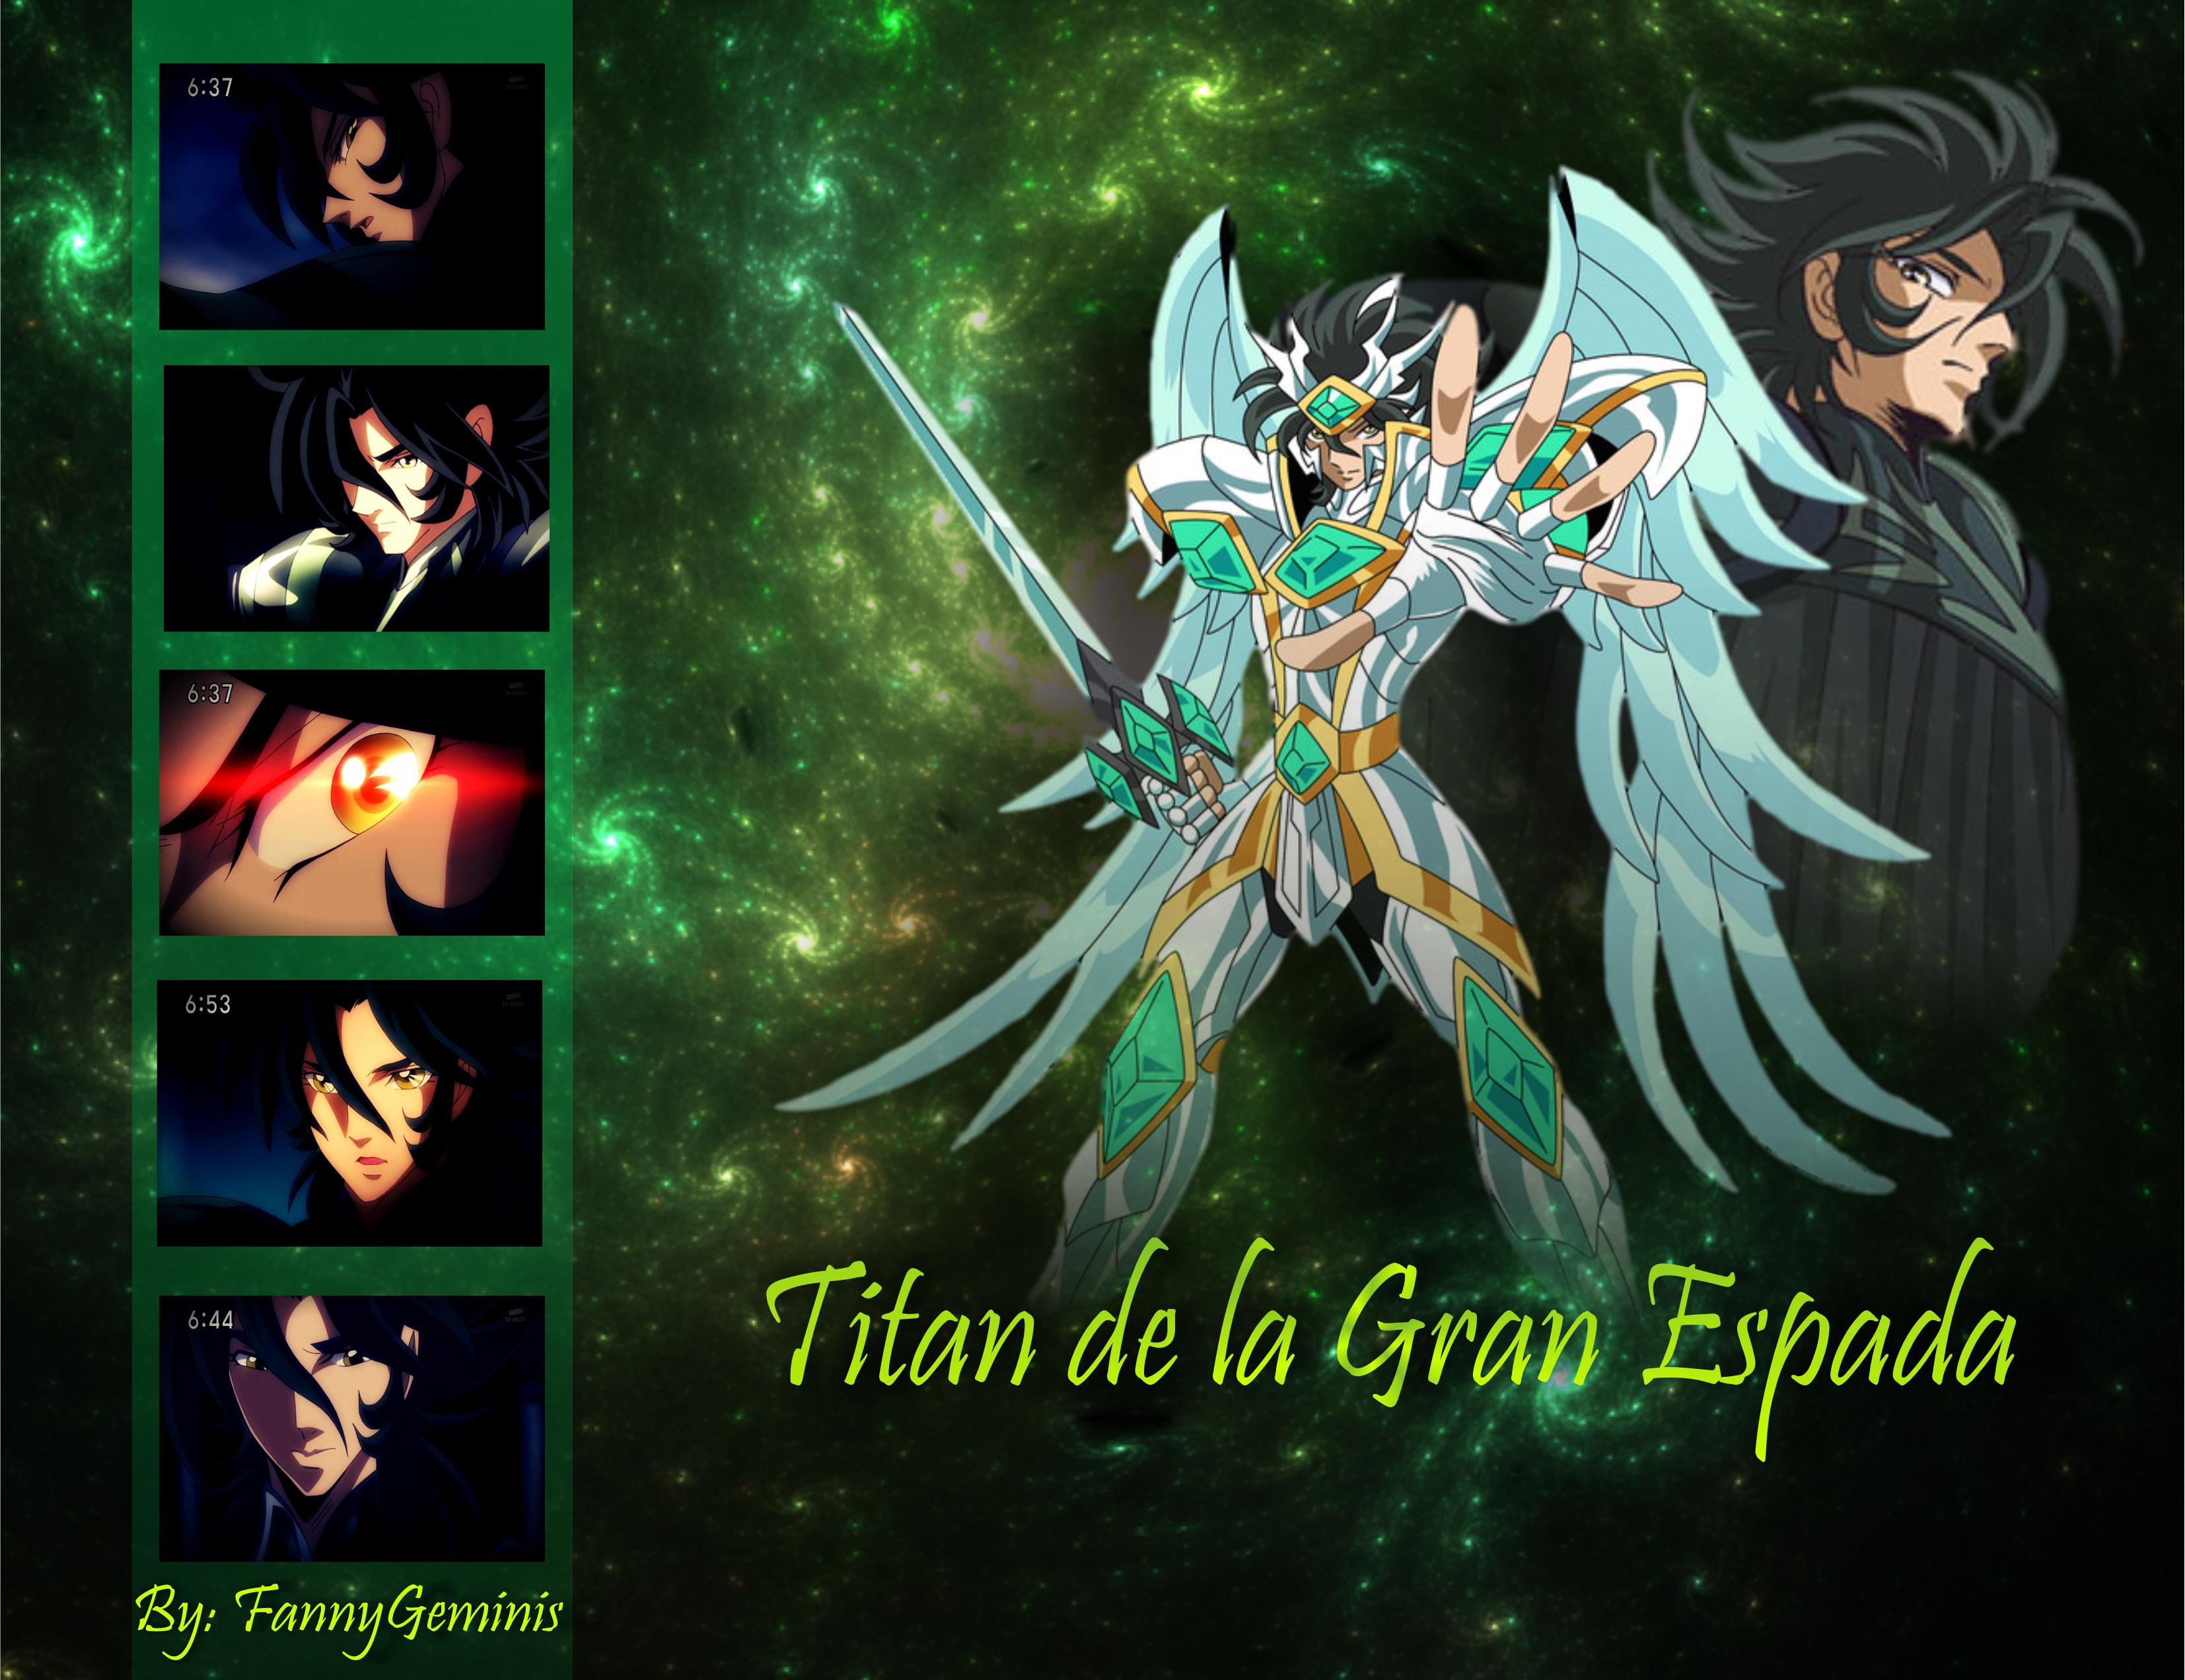 Titan de la Gran Espada - Saint Seiya Omega by